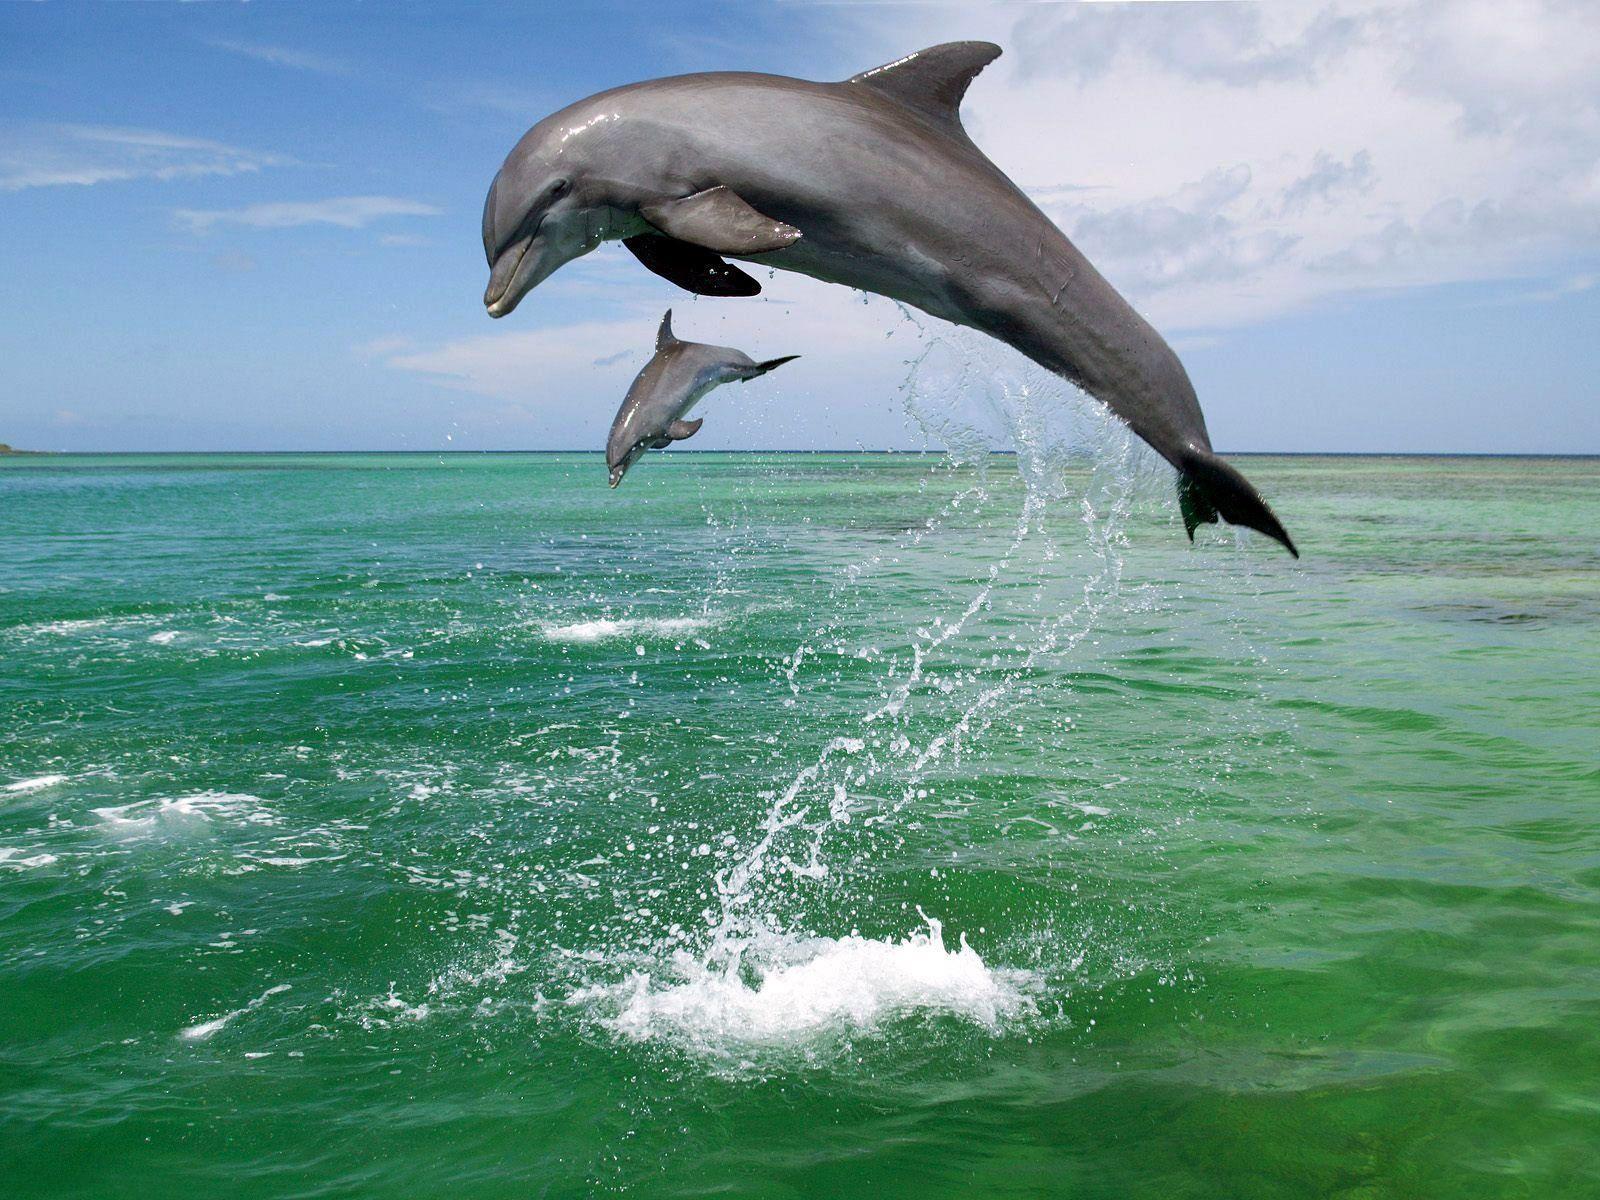 Delphin Pictures